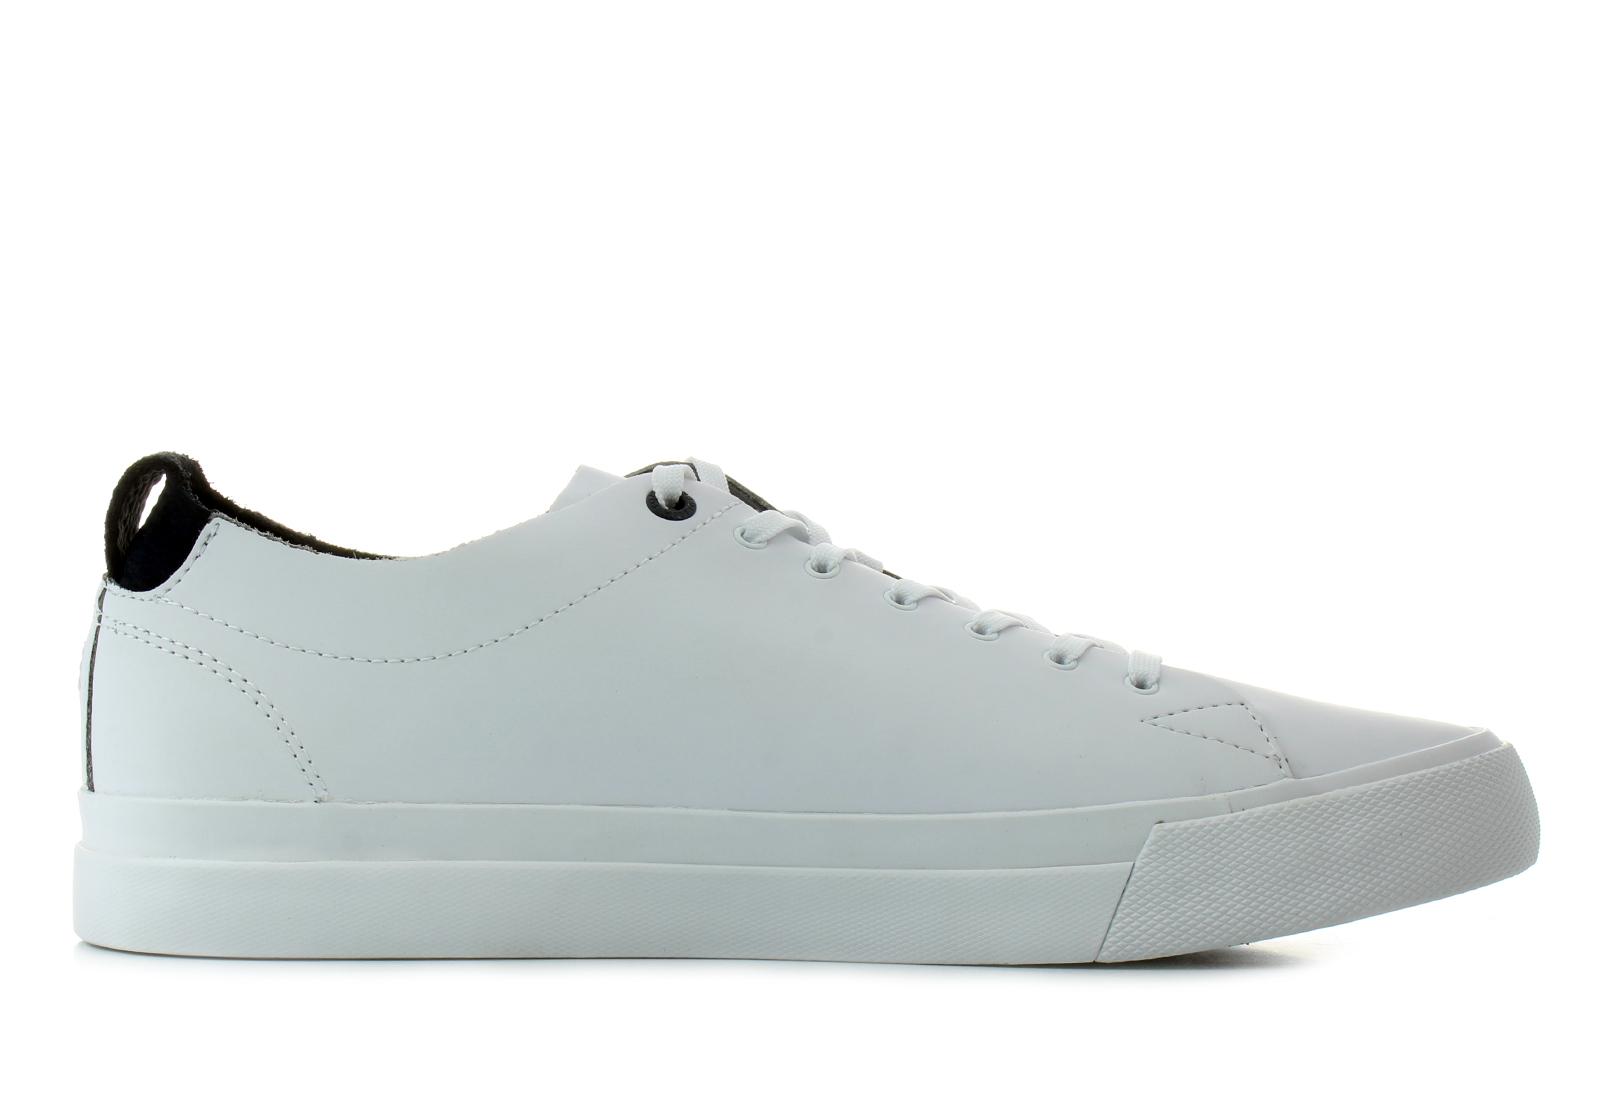 969c9047e0 Tommy Hilfiger Cipő - Dino 1a - 18S-1214-100 - Office Shoes Magyarország